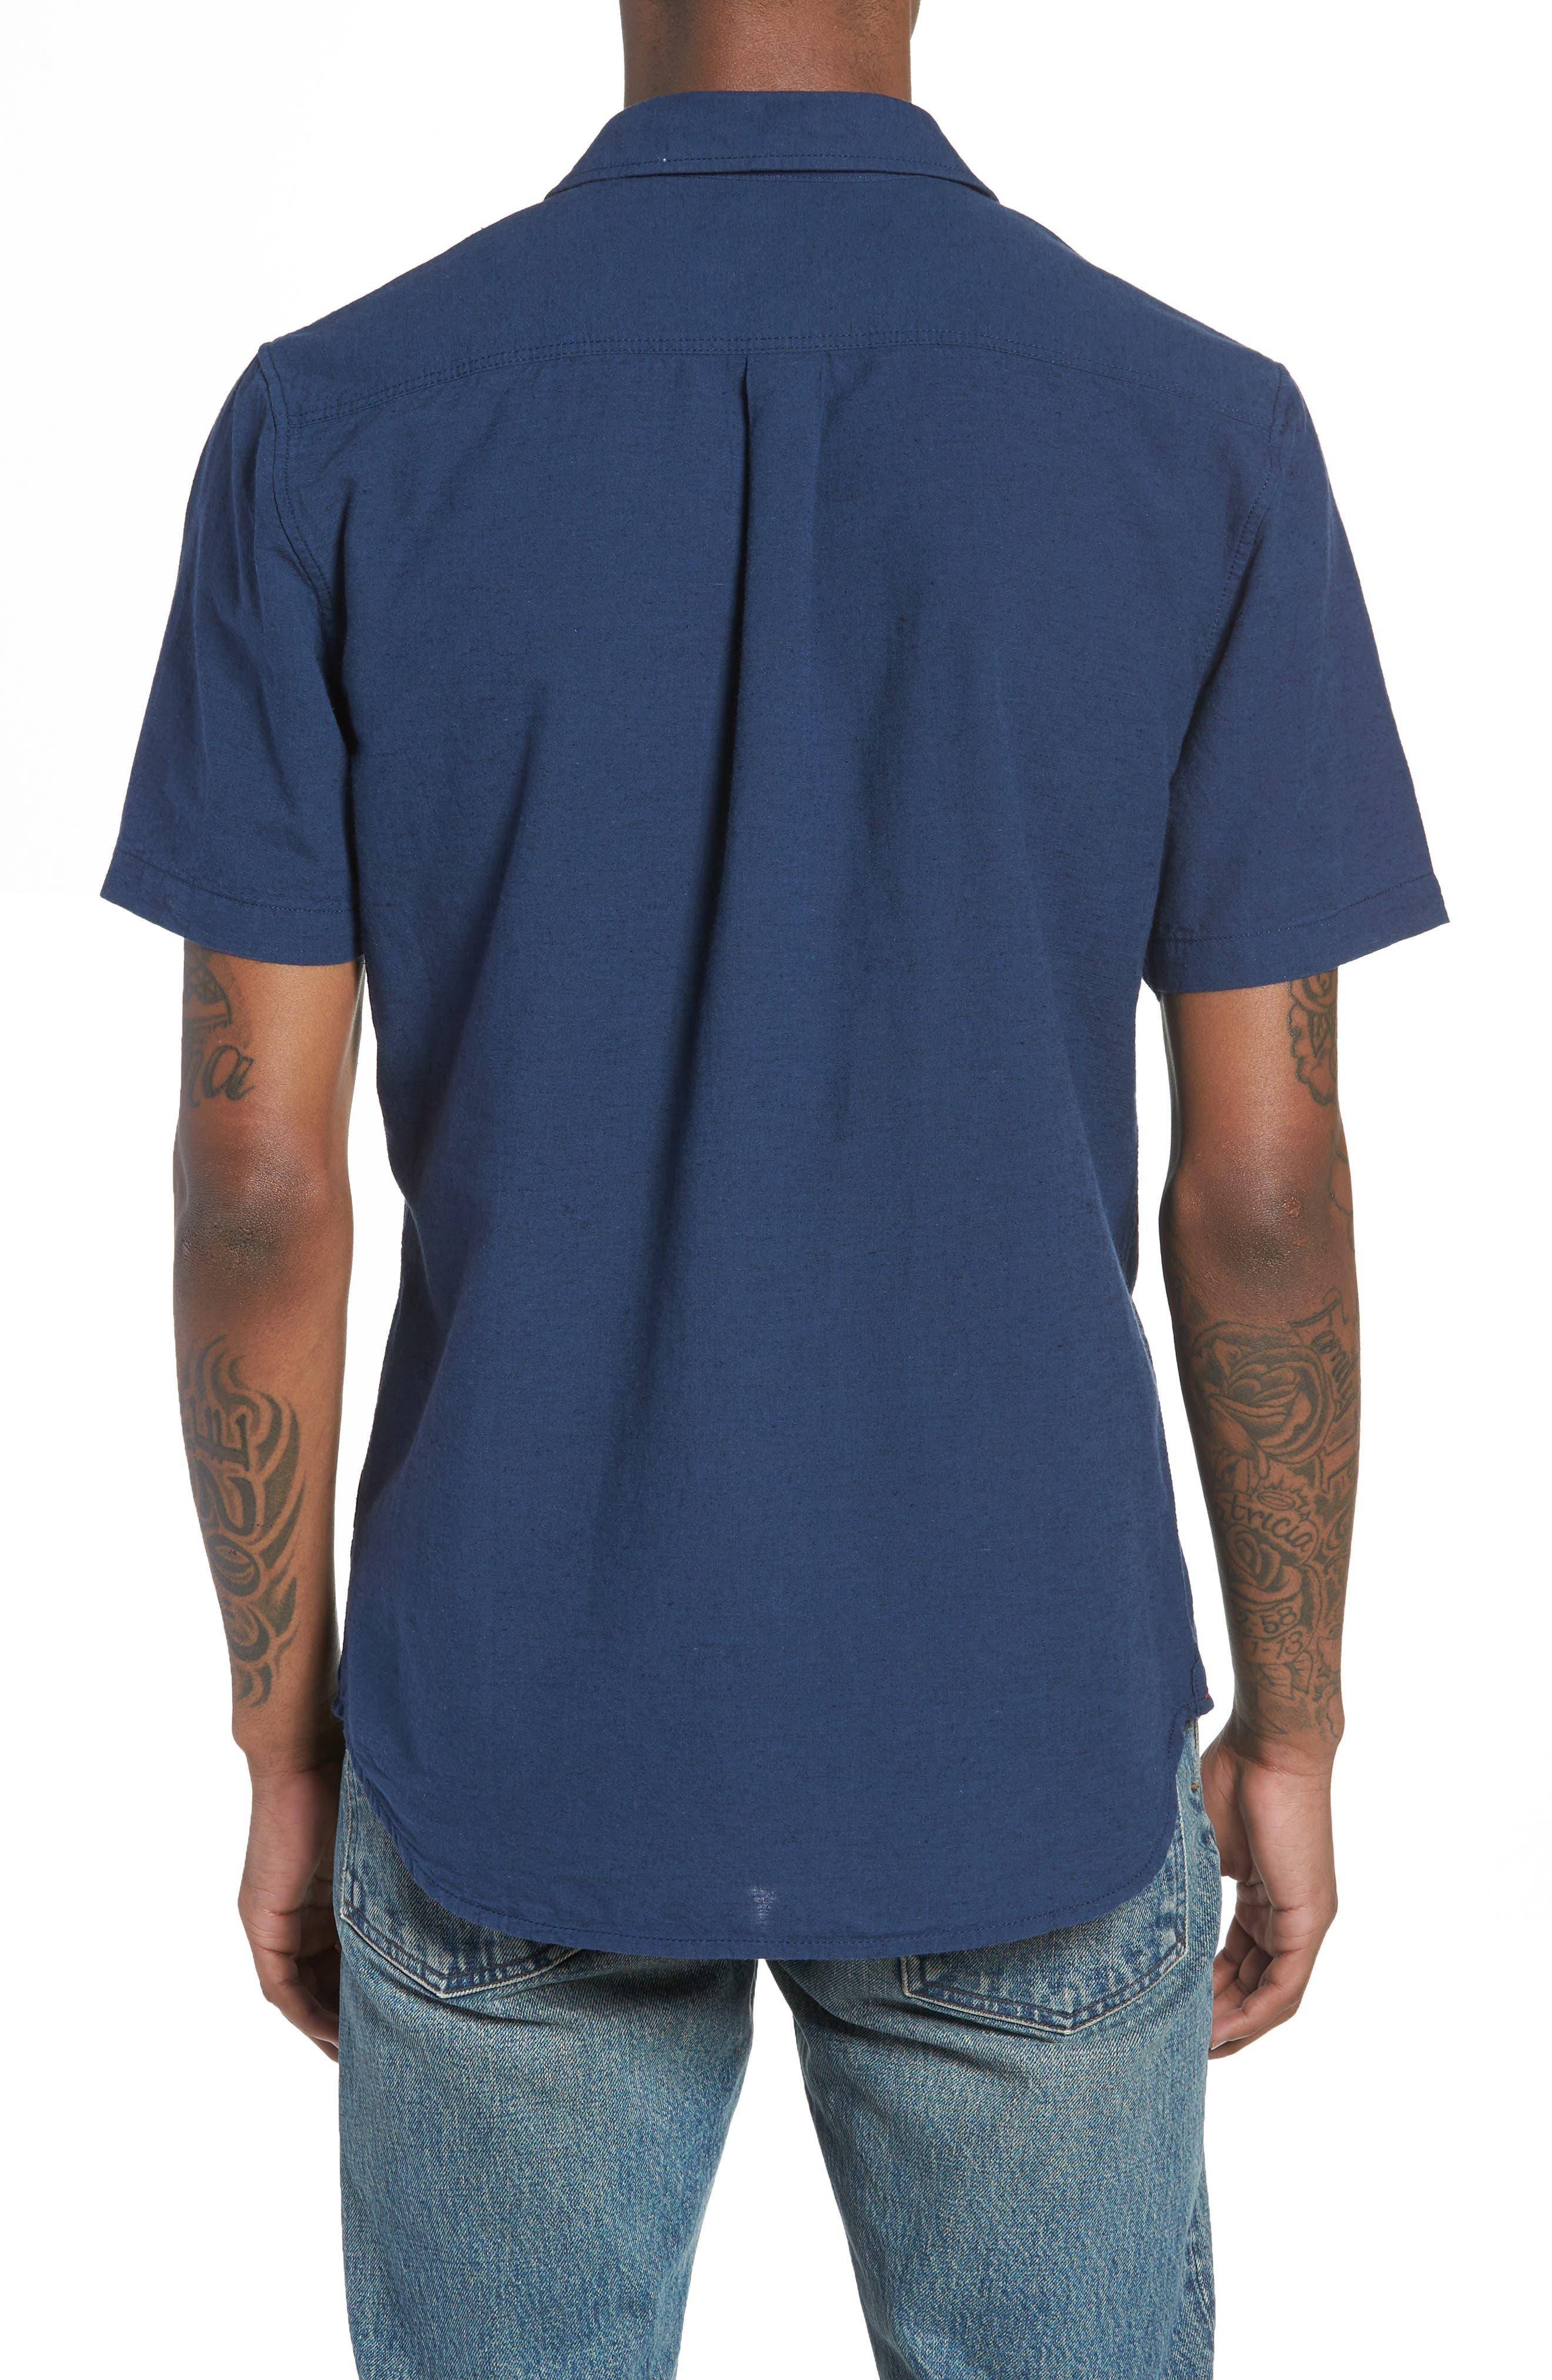 Thurber Short Sleeve Shirt,                             Alternate thumbnail 2, color,                             Dress Blues